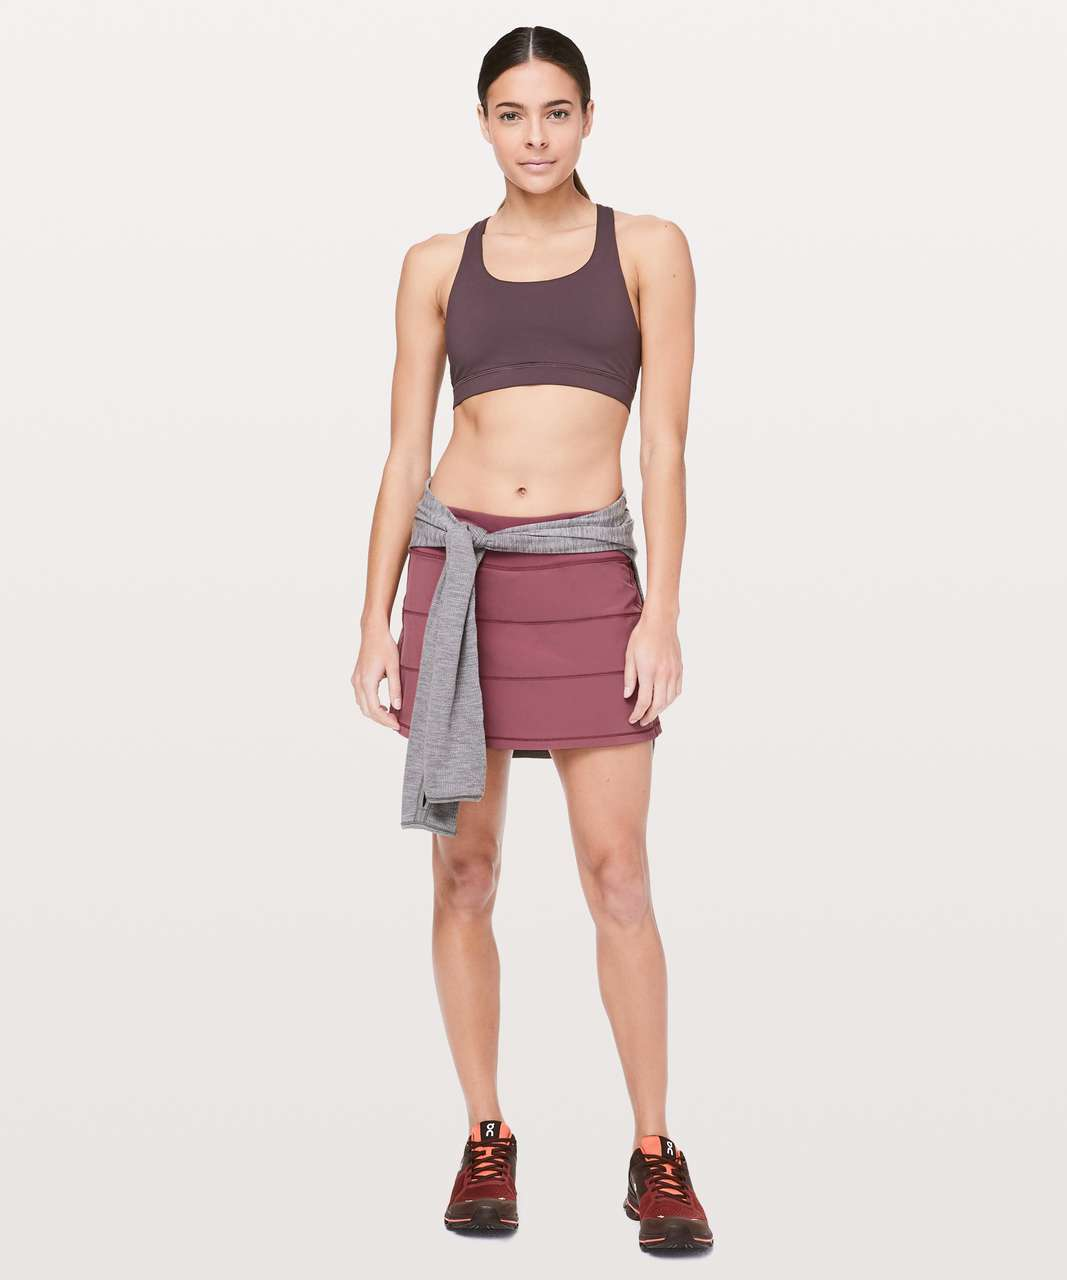 "Lululemon Pace Rival Skirt (Tall) *4-way Stretch 15"" - Misty Merlot"